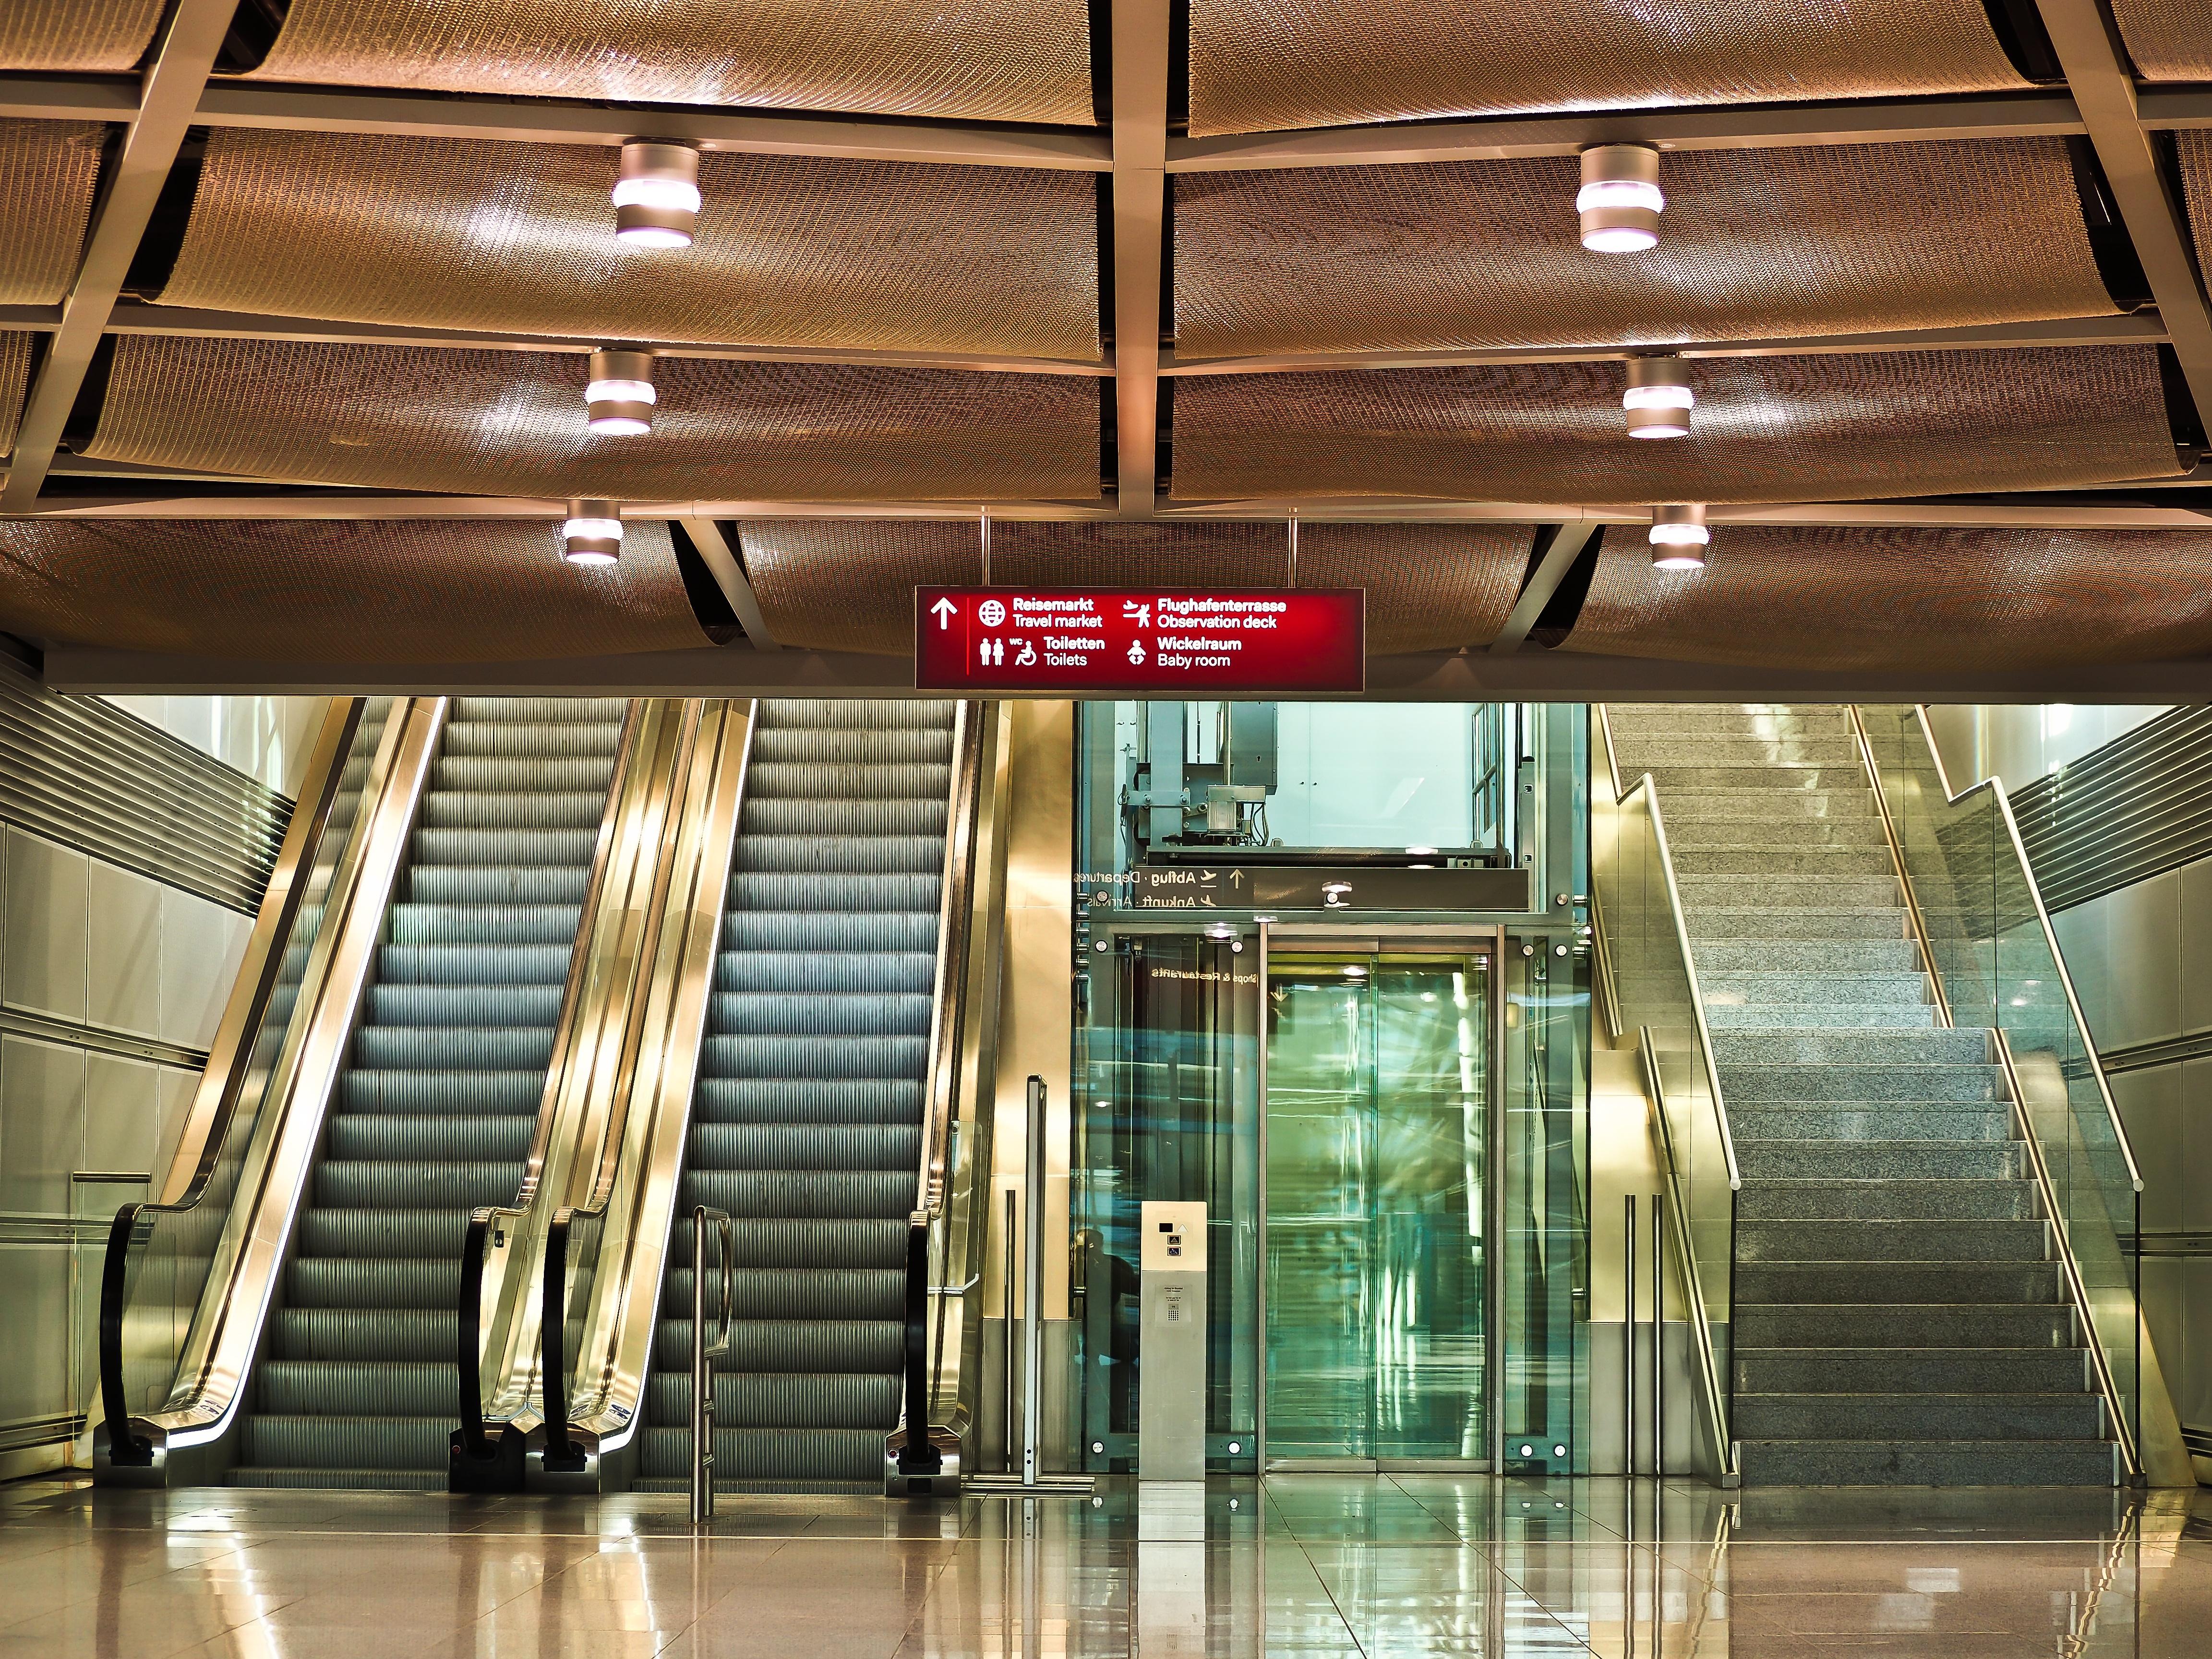 Design Düsseldorf free images architecture glass building city escalator